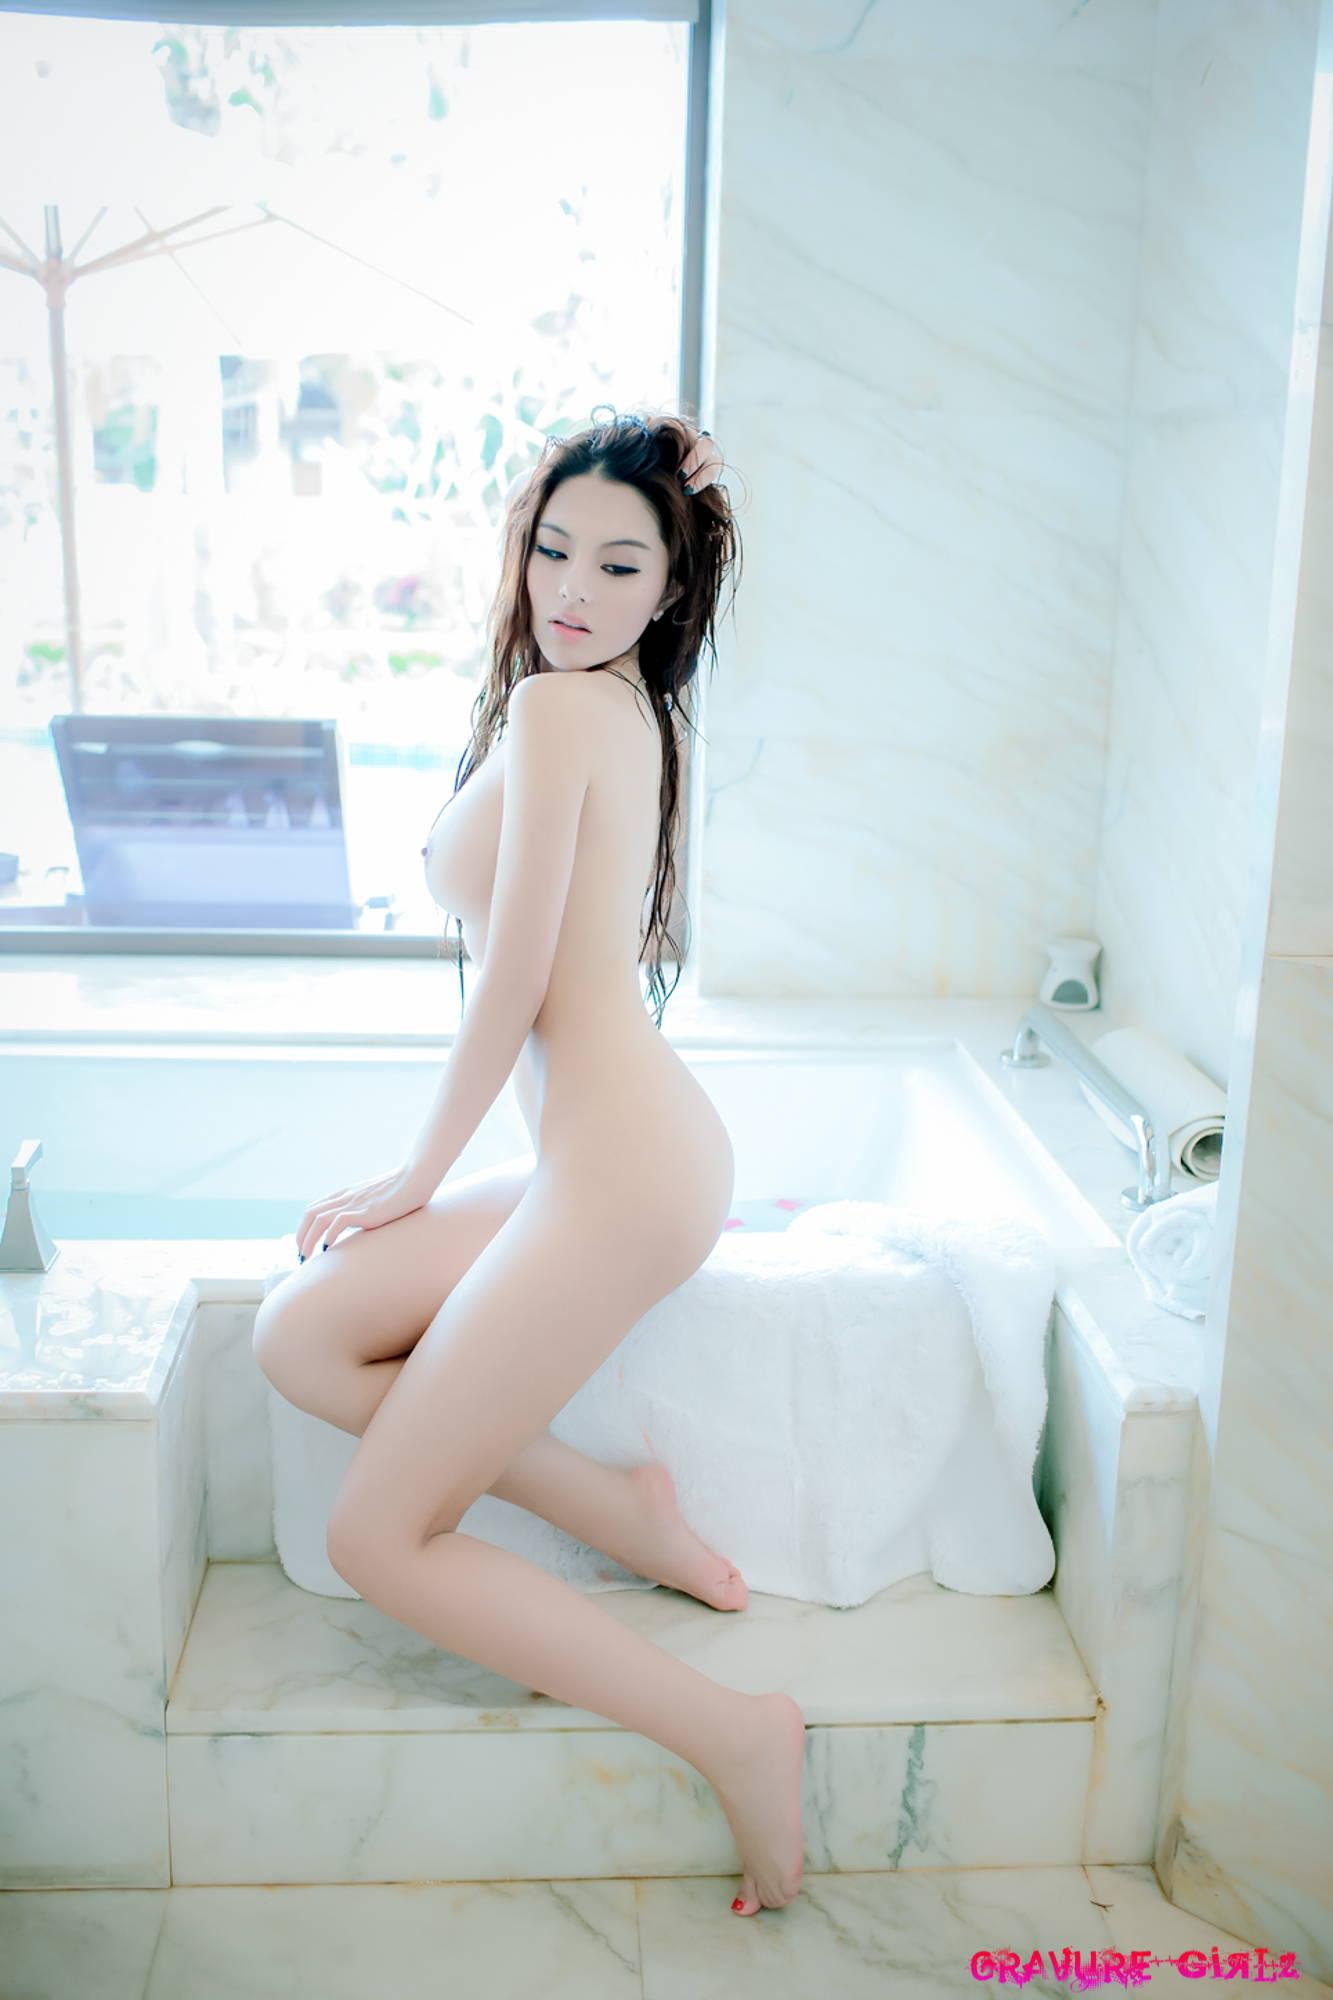 sexy white girl twerking nude